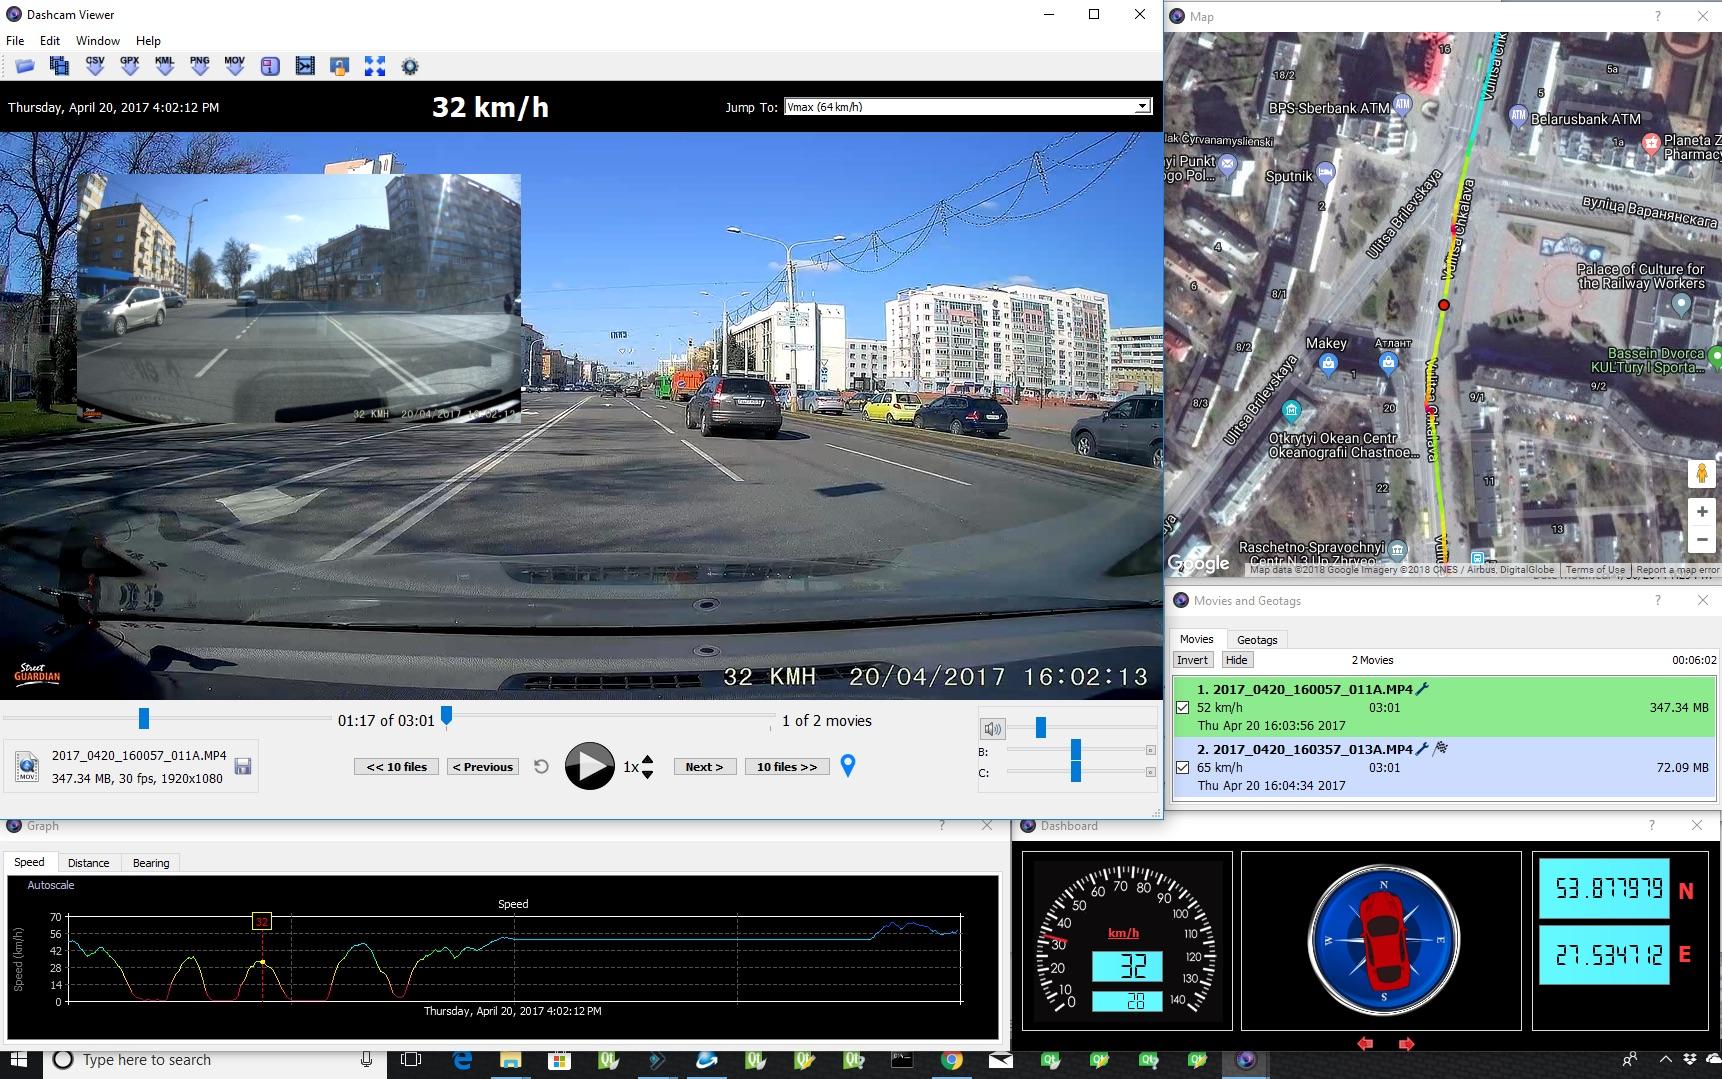 Dashcam Viewer v3 0 0 Released for Mac and Windows – Dashcam